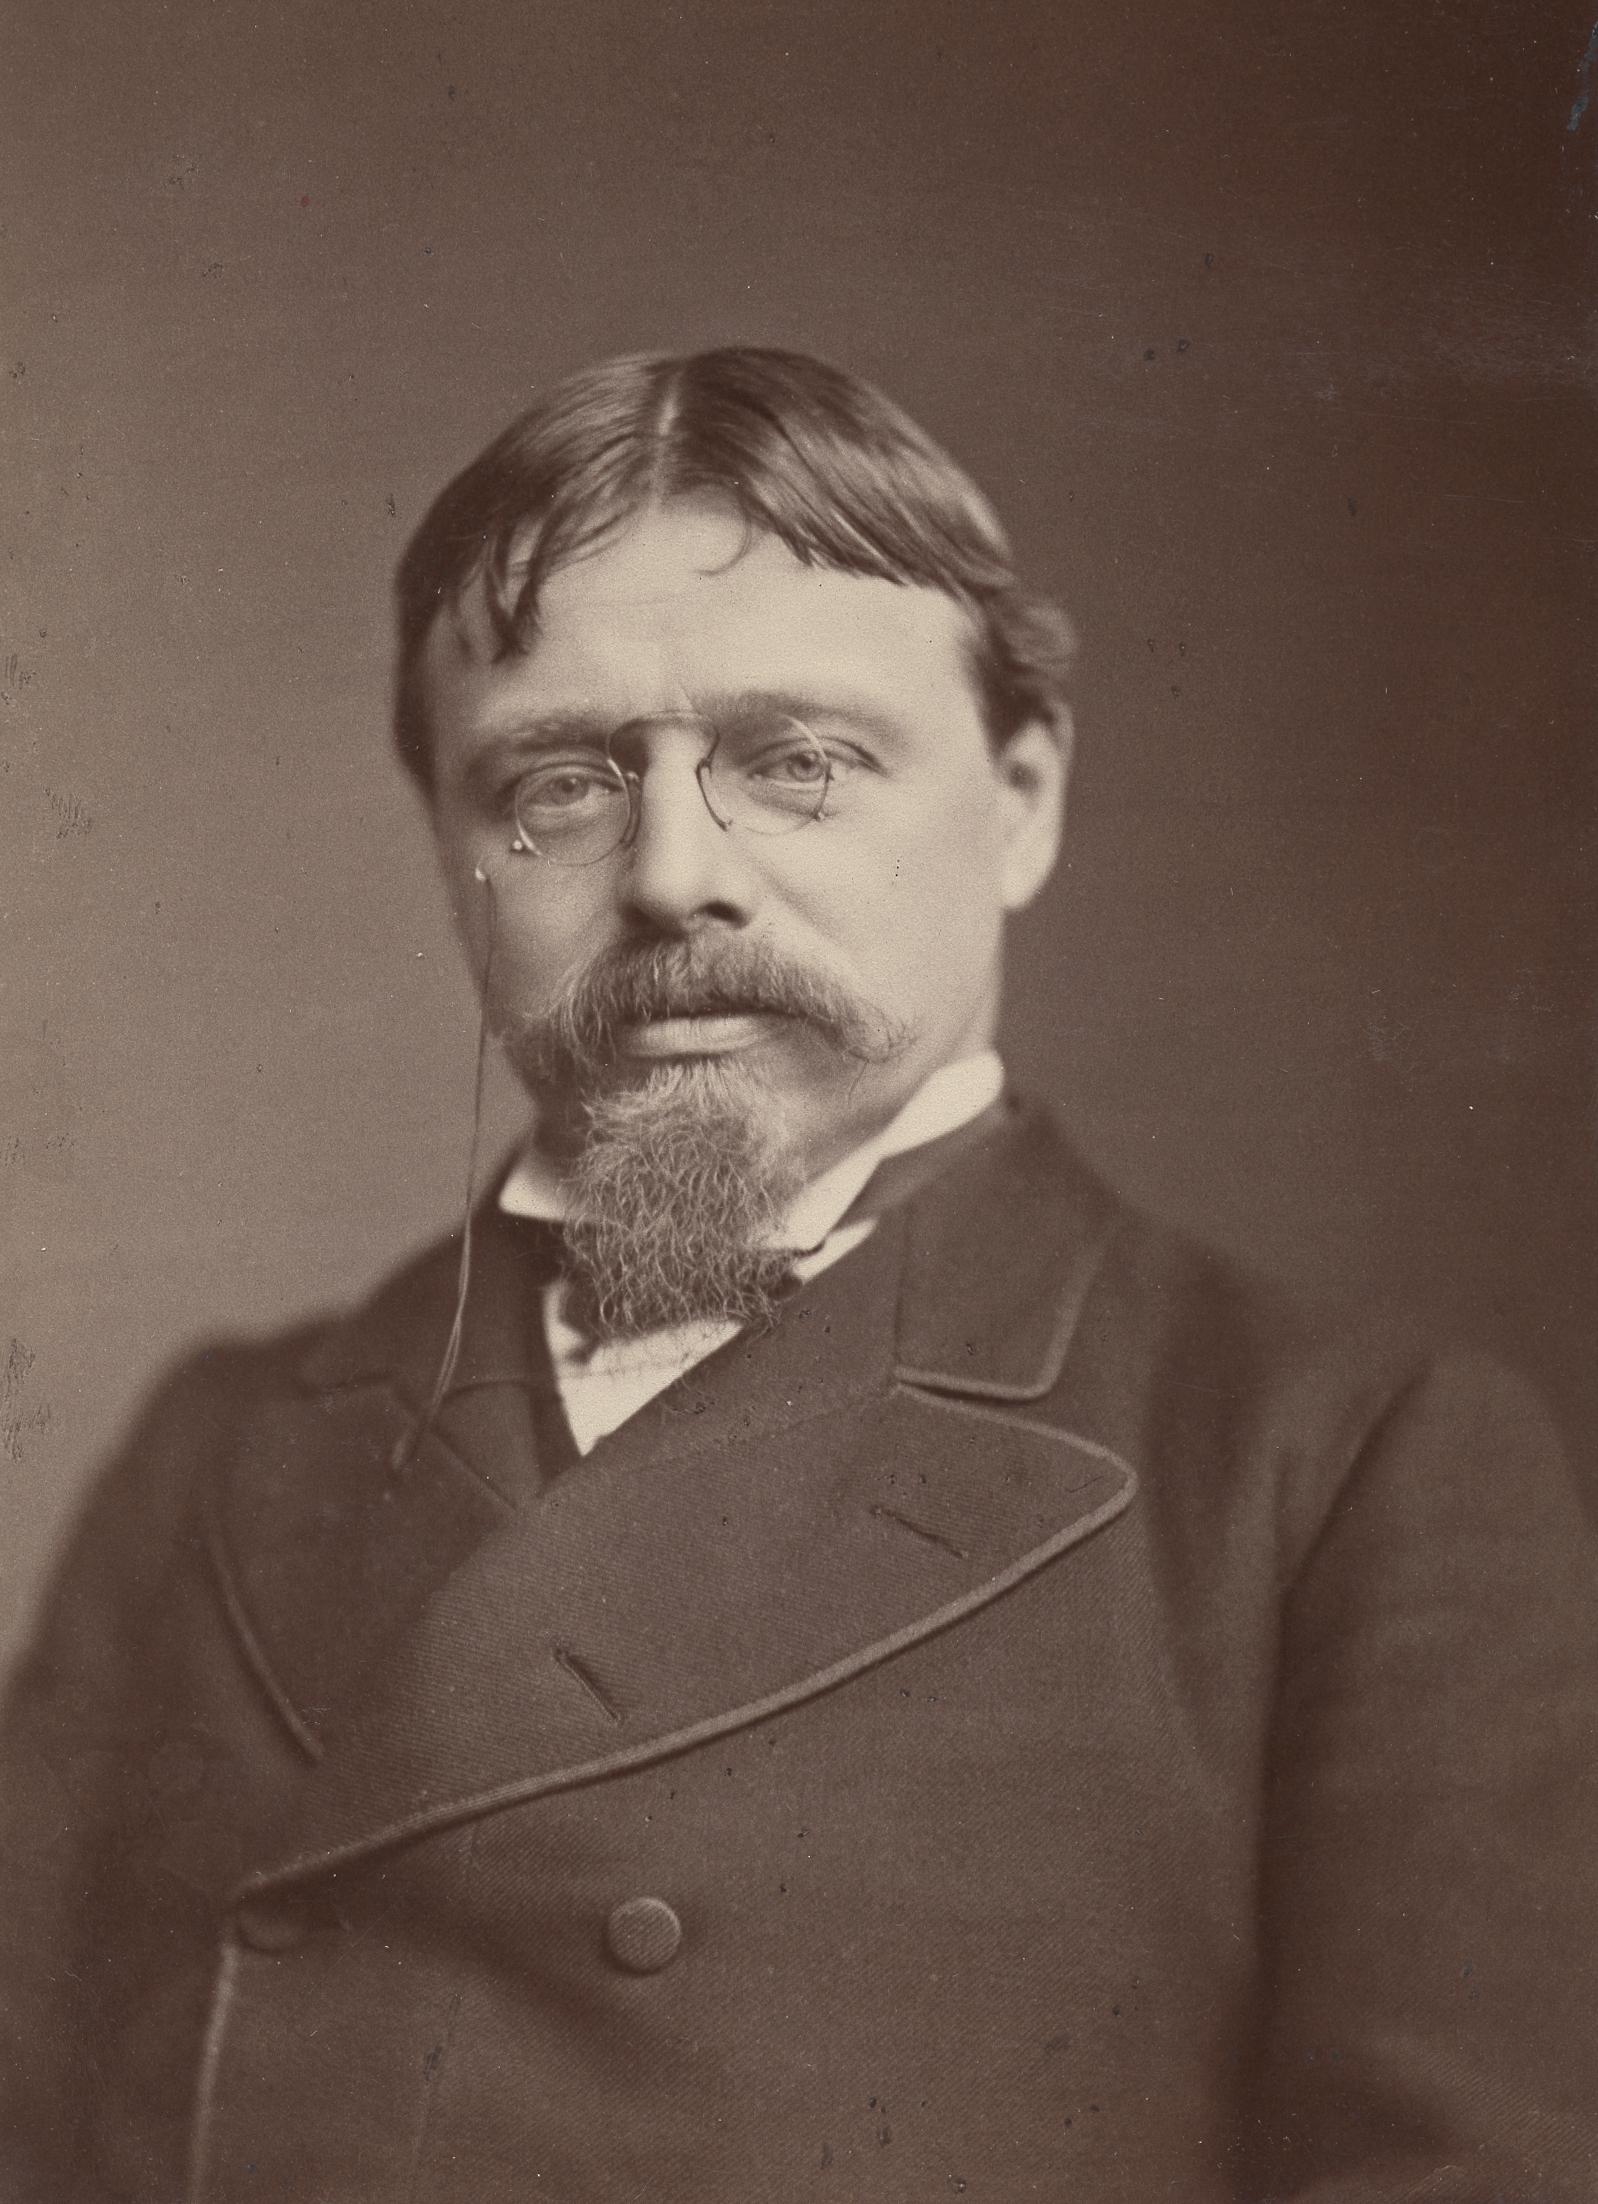 Depiction of Lawrence Alma-Tadema